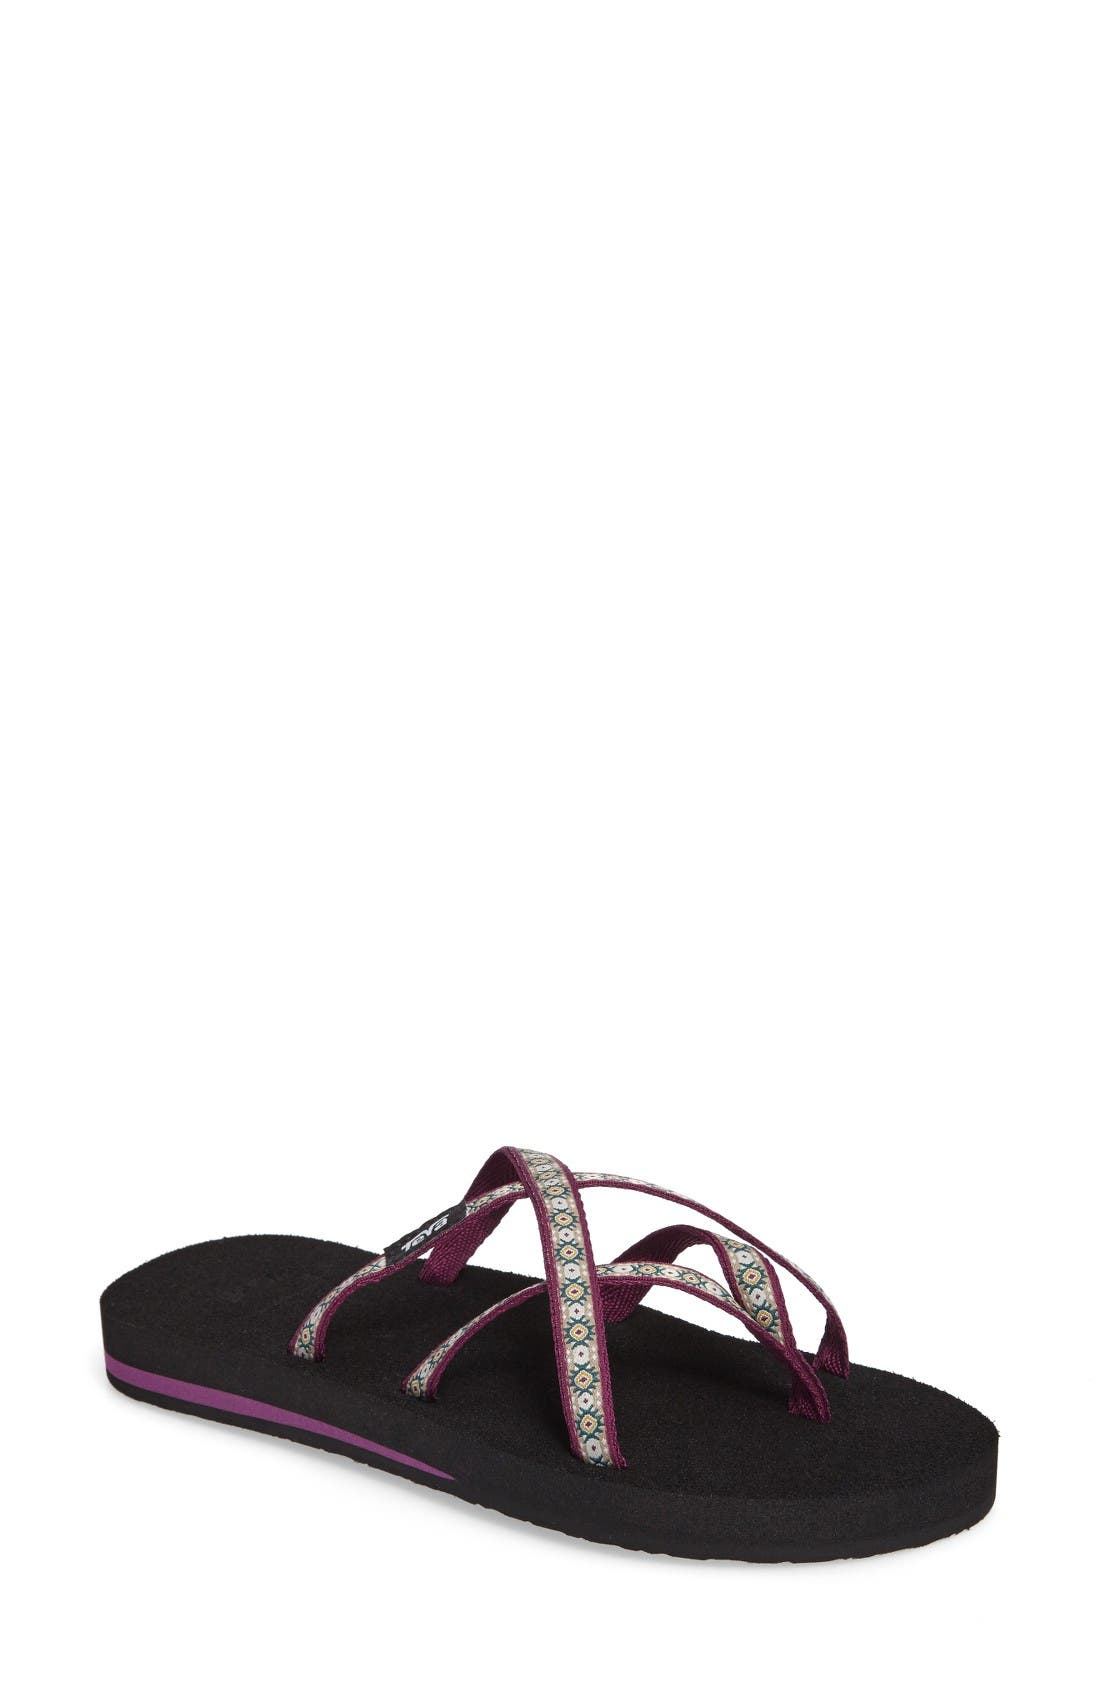 Alternate Image 1 Selected - Teva 'Olowahu' Sandal (Women)